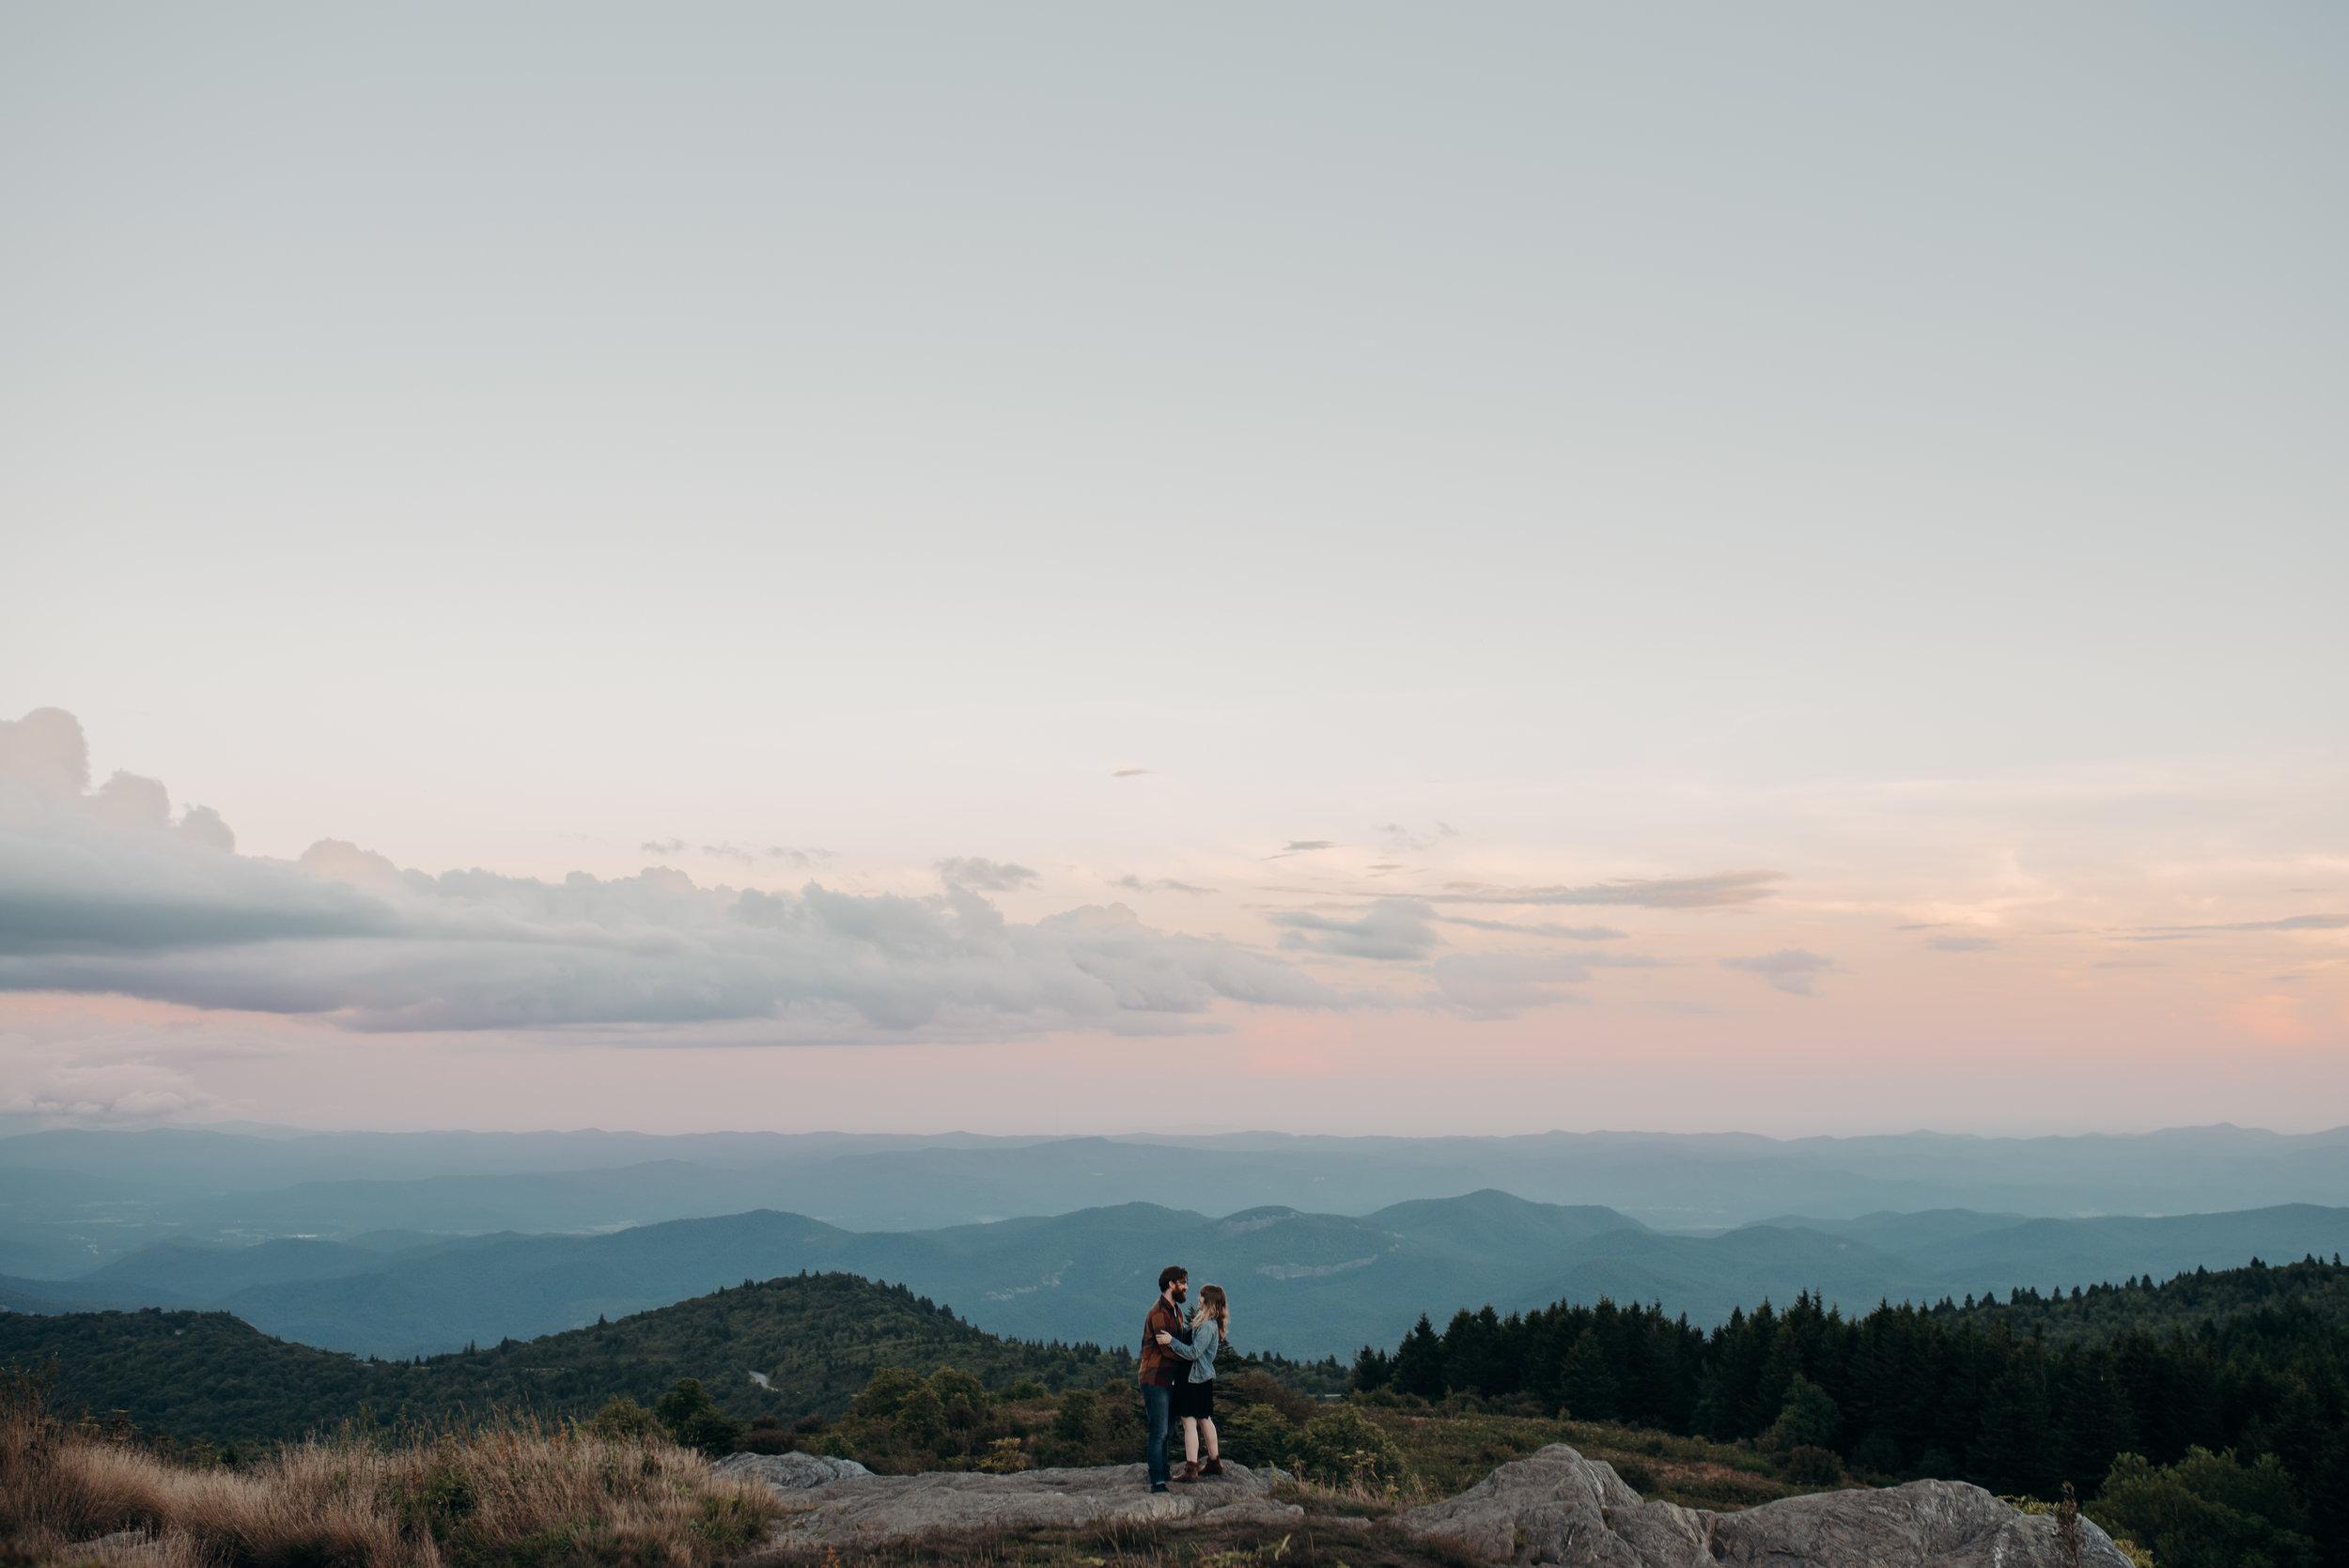 leah-joe-middleton-asheville-north-carolina-couple-session-destination-elopement-photographer-fox-and-film-166.jpg